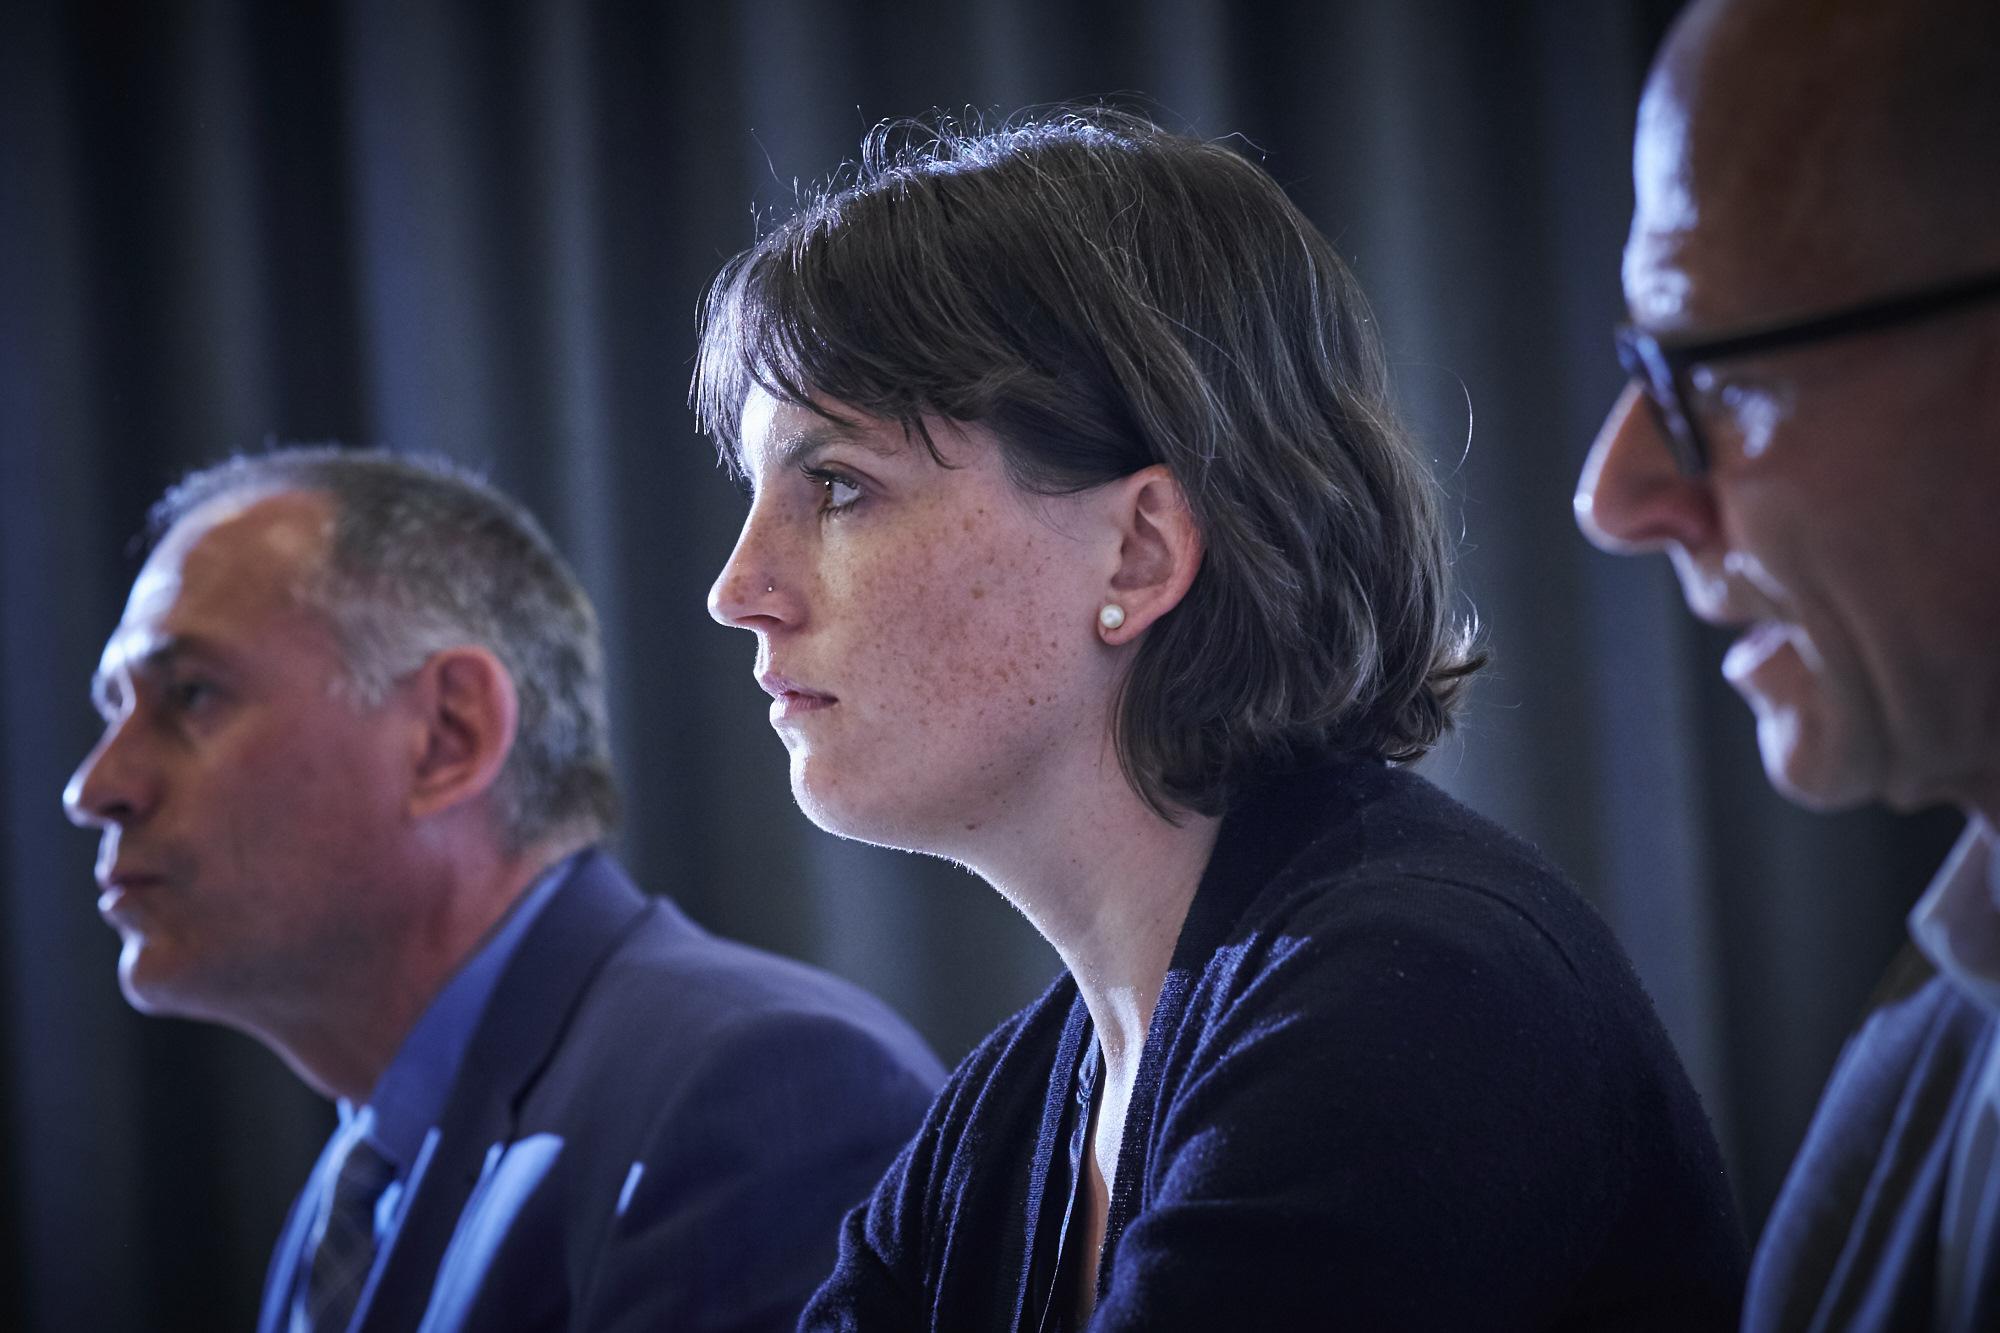 Mirjam Ballmer verteidigte an der Pressekonferenz Anfang September Hans-Peter Wessels und den Kurs der BVB. Damit verärgerte